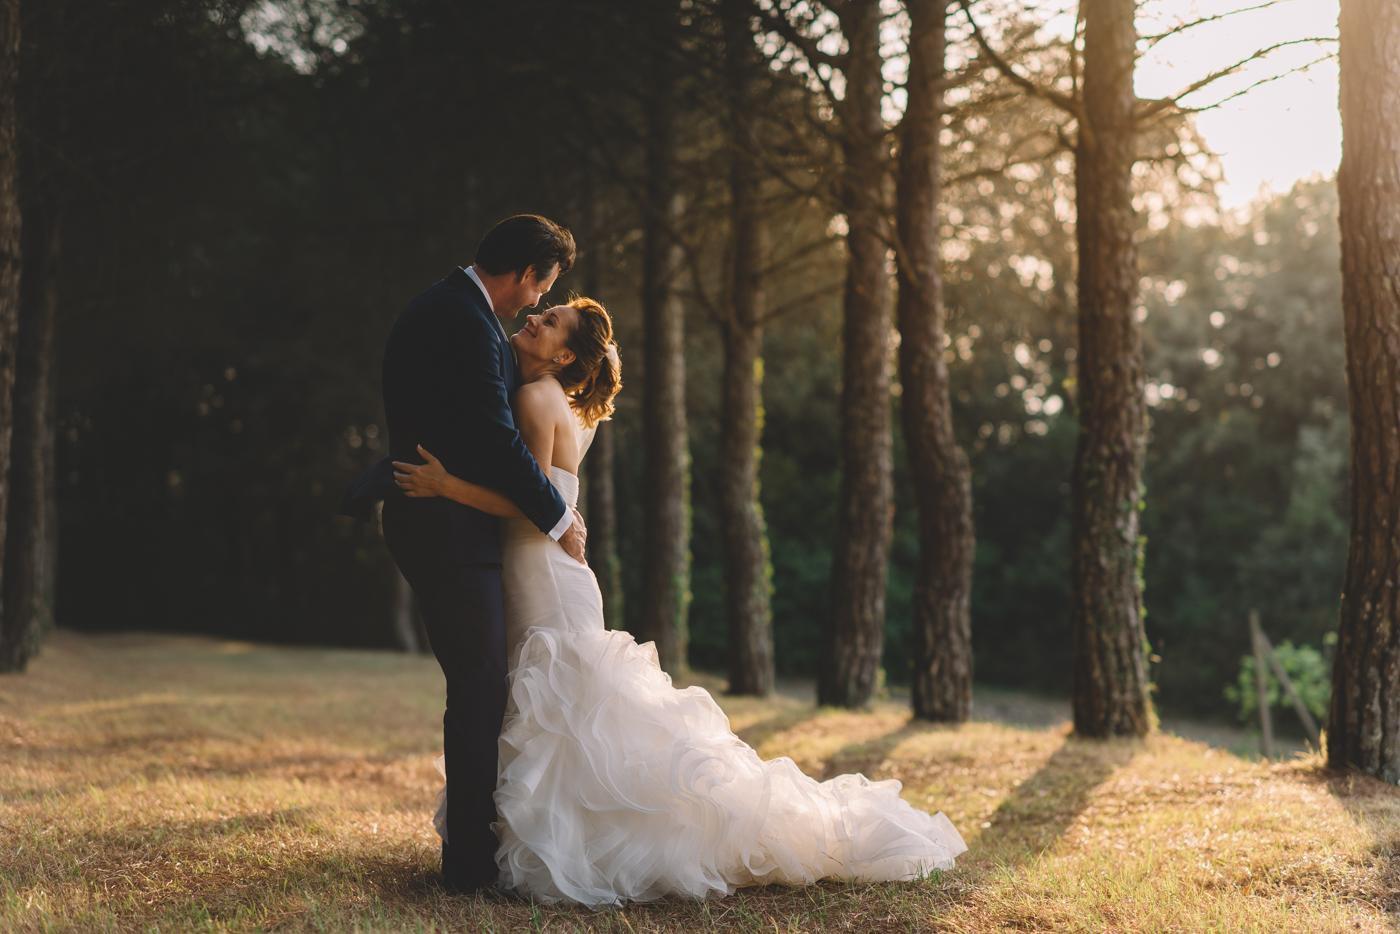 Wedding_Photographer_in_Tuscany.jpg